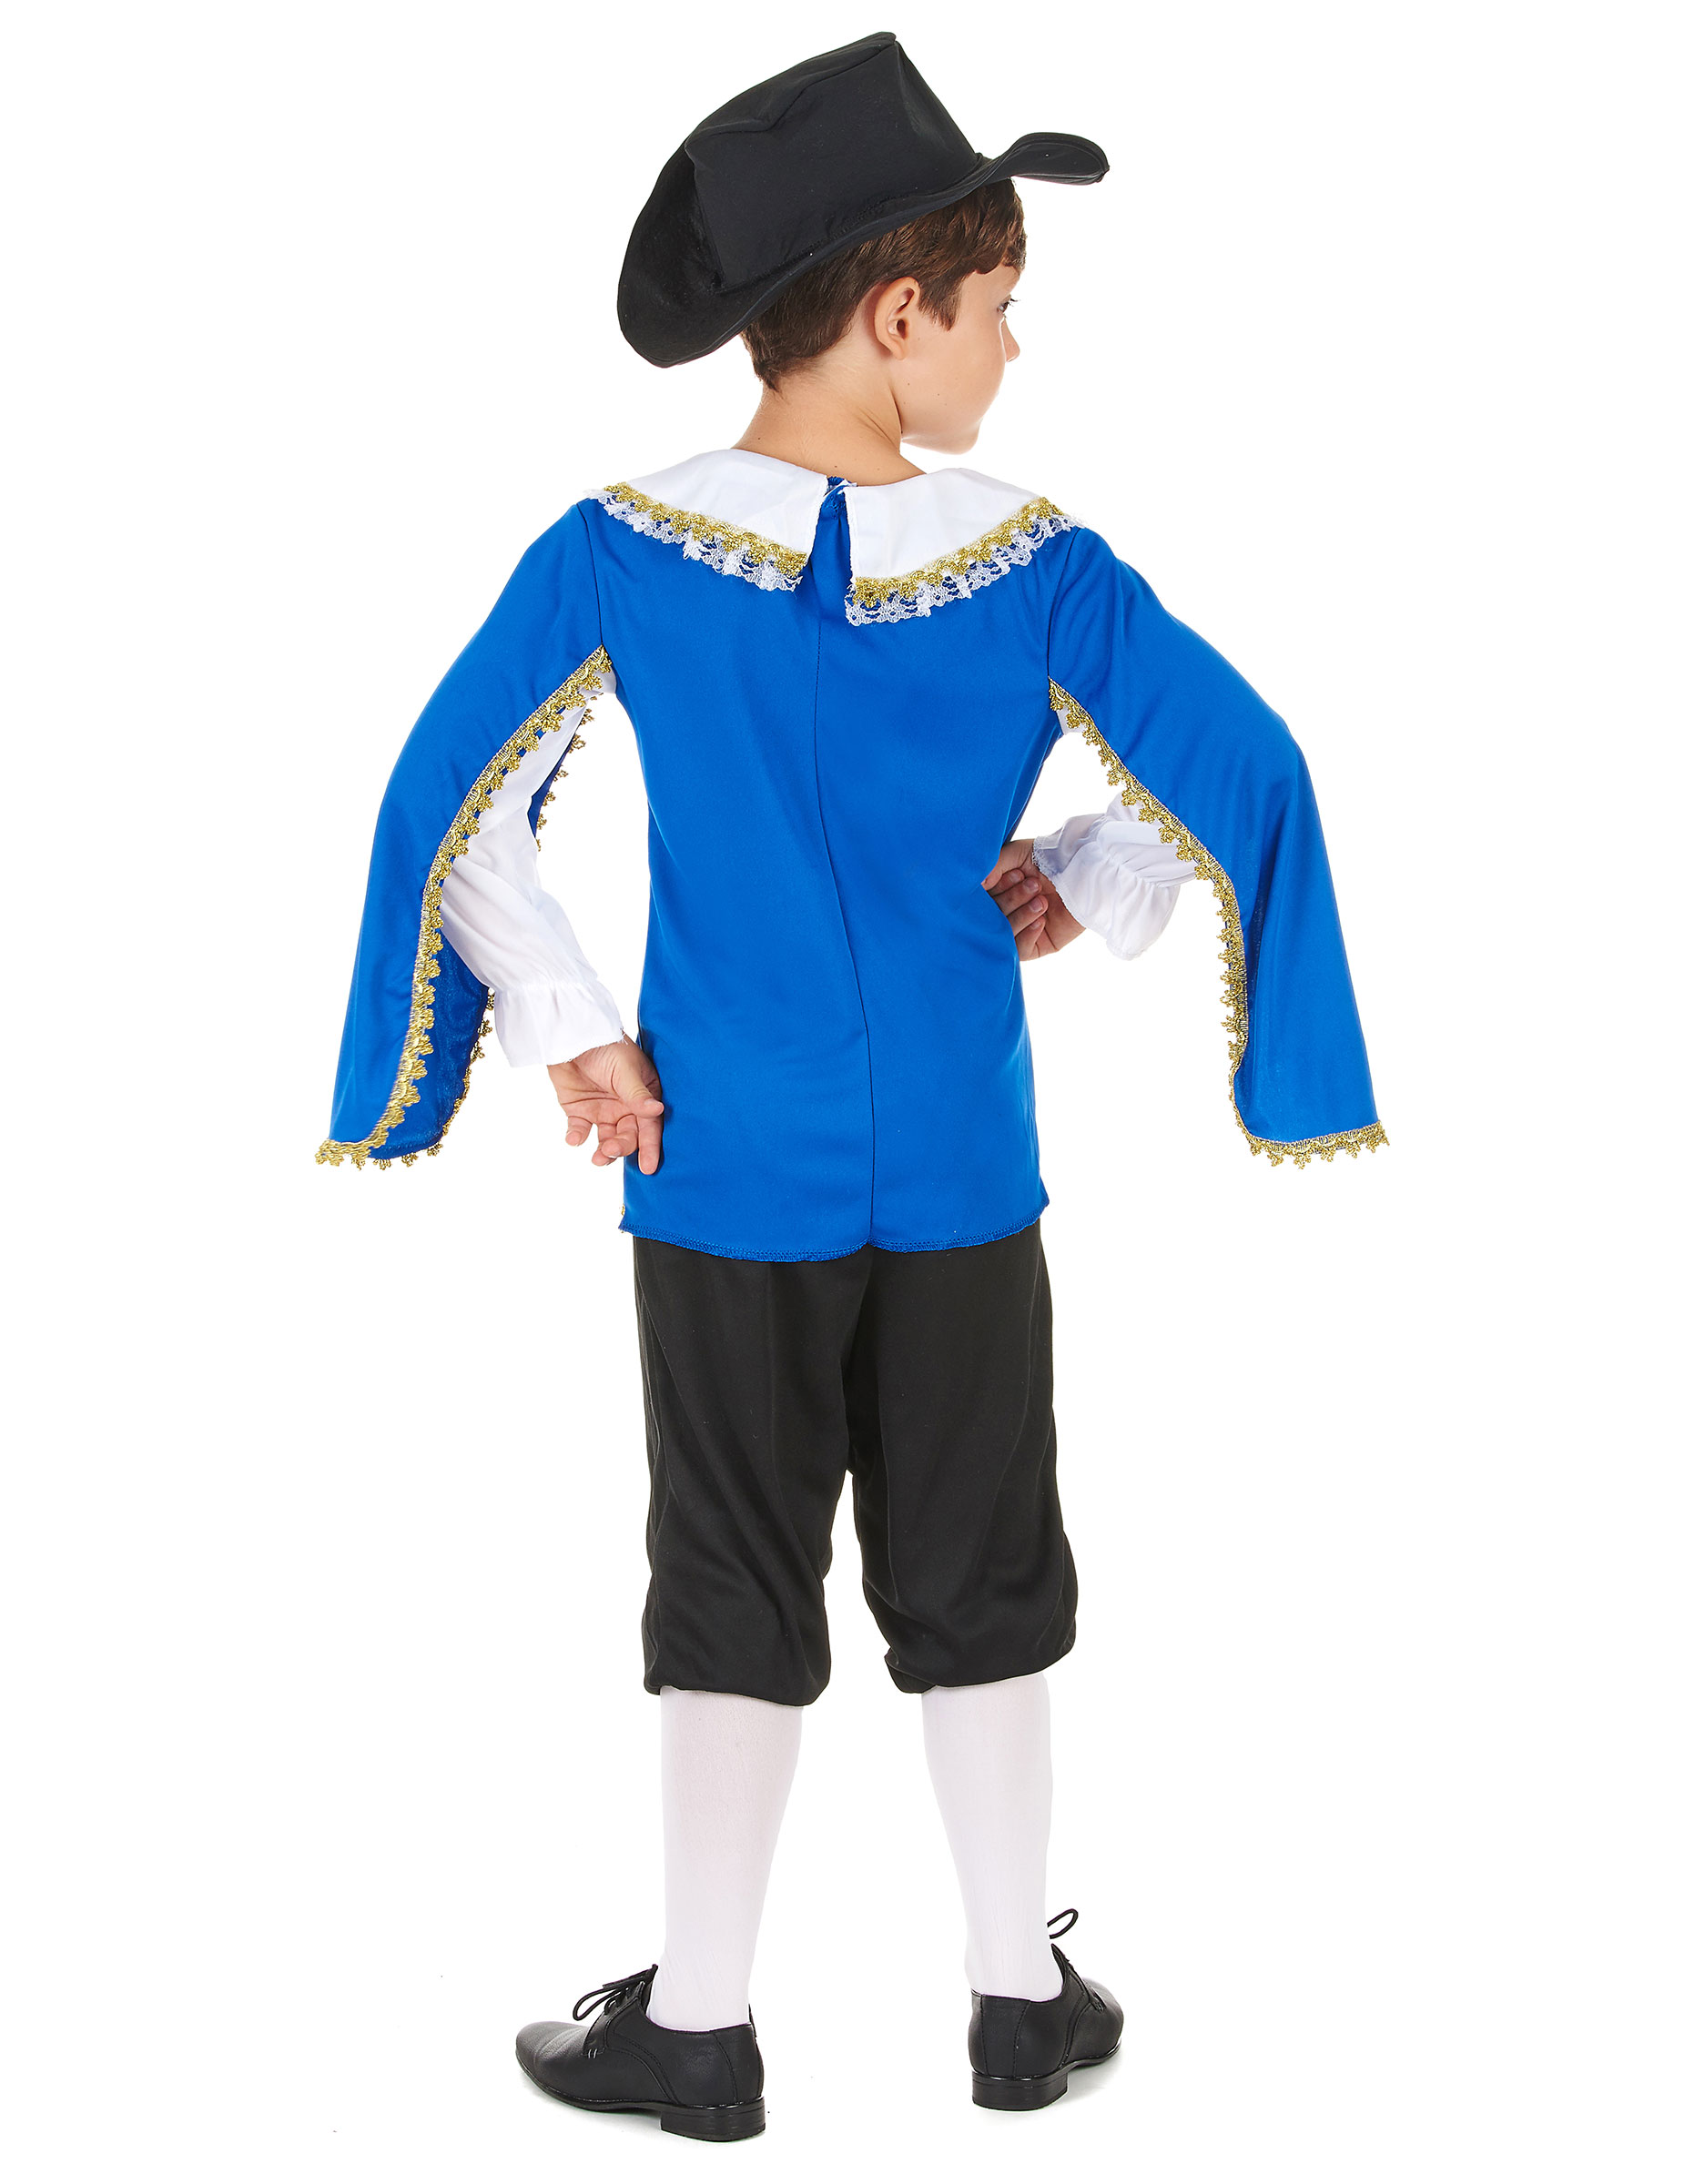 Costume moschettiere blu bambino  Costumi bambini 27ce0b947d70